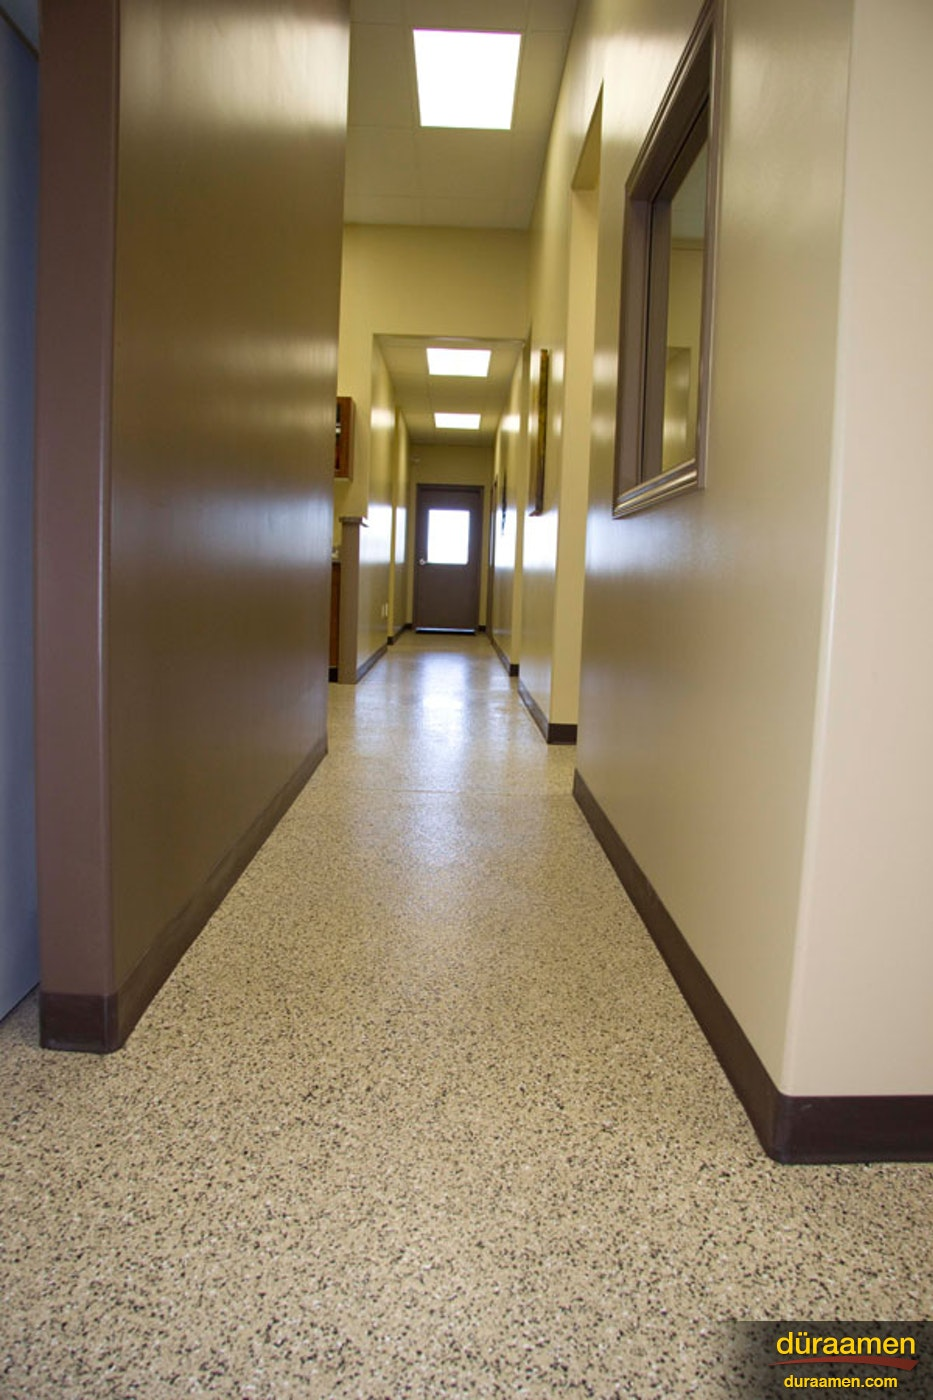 Veterinary Clinic Toronto Duraamen